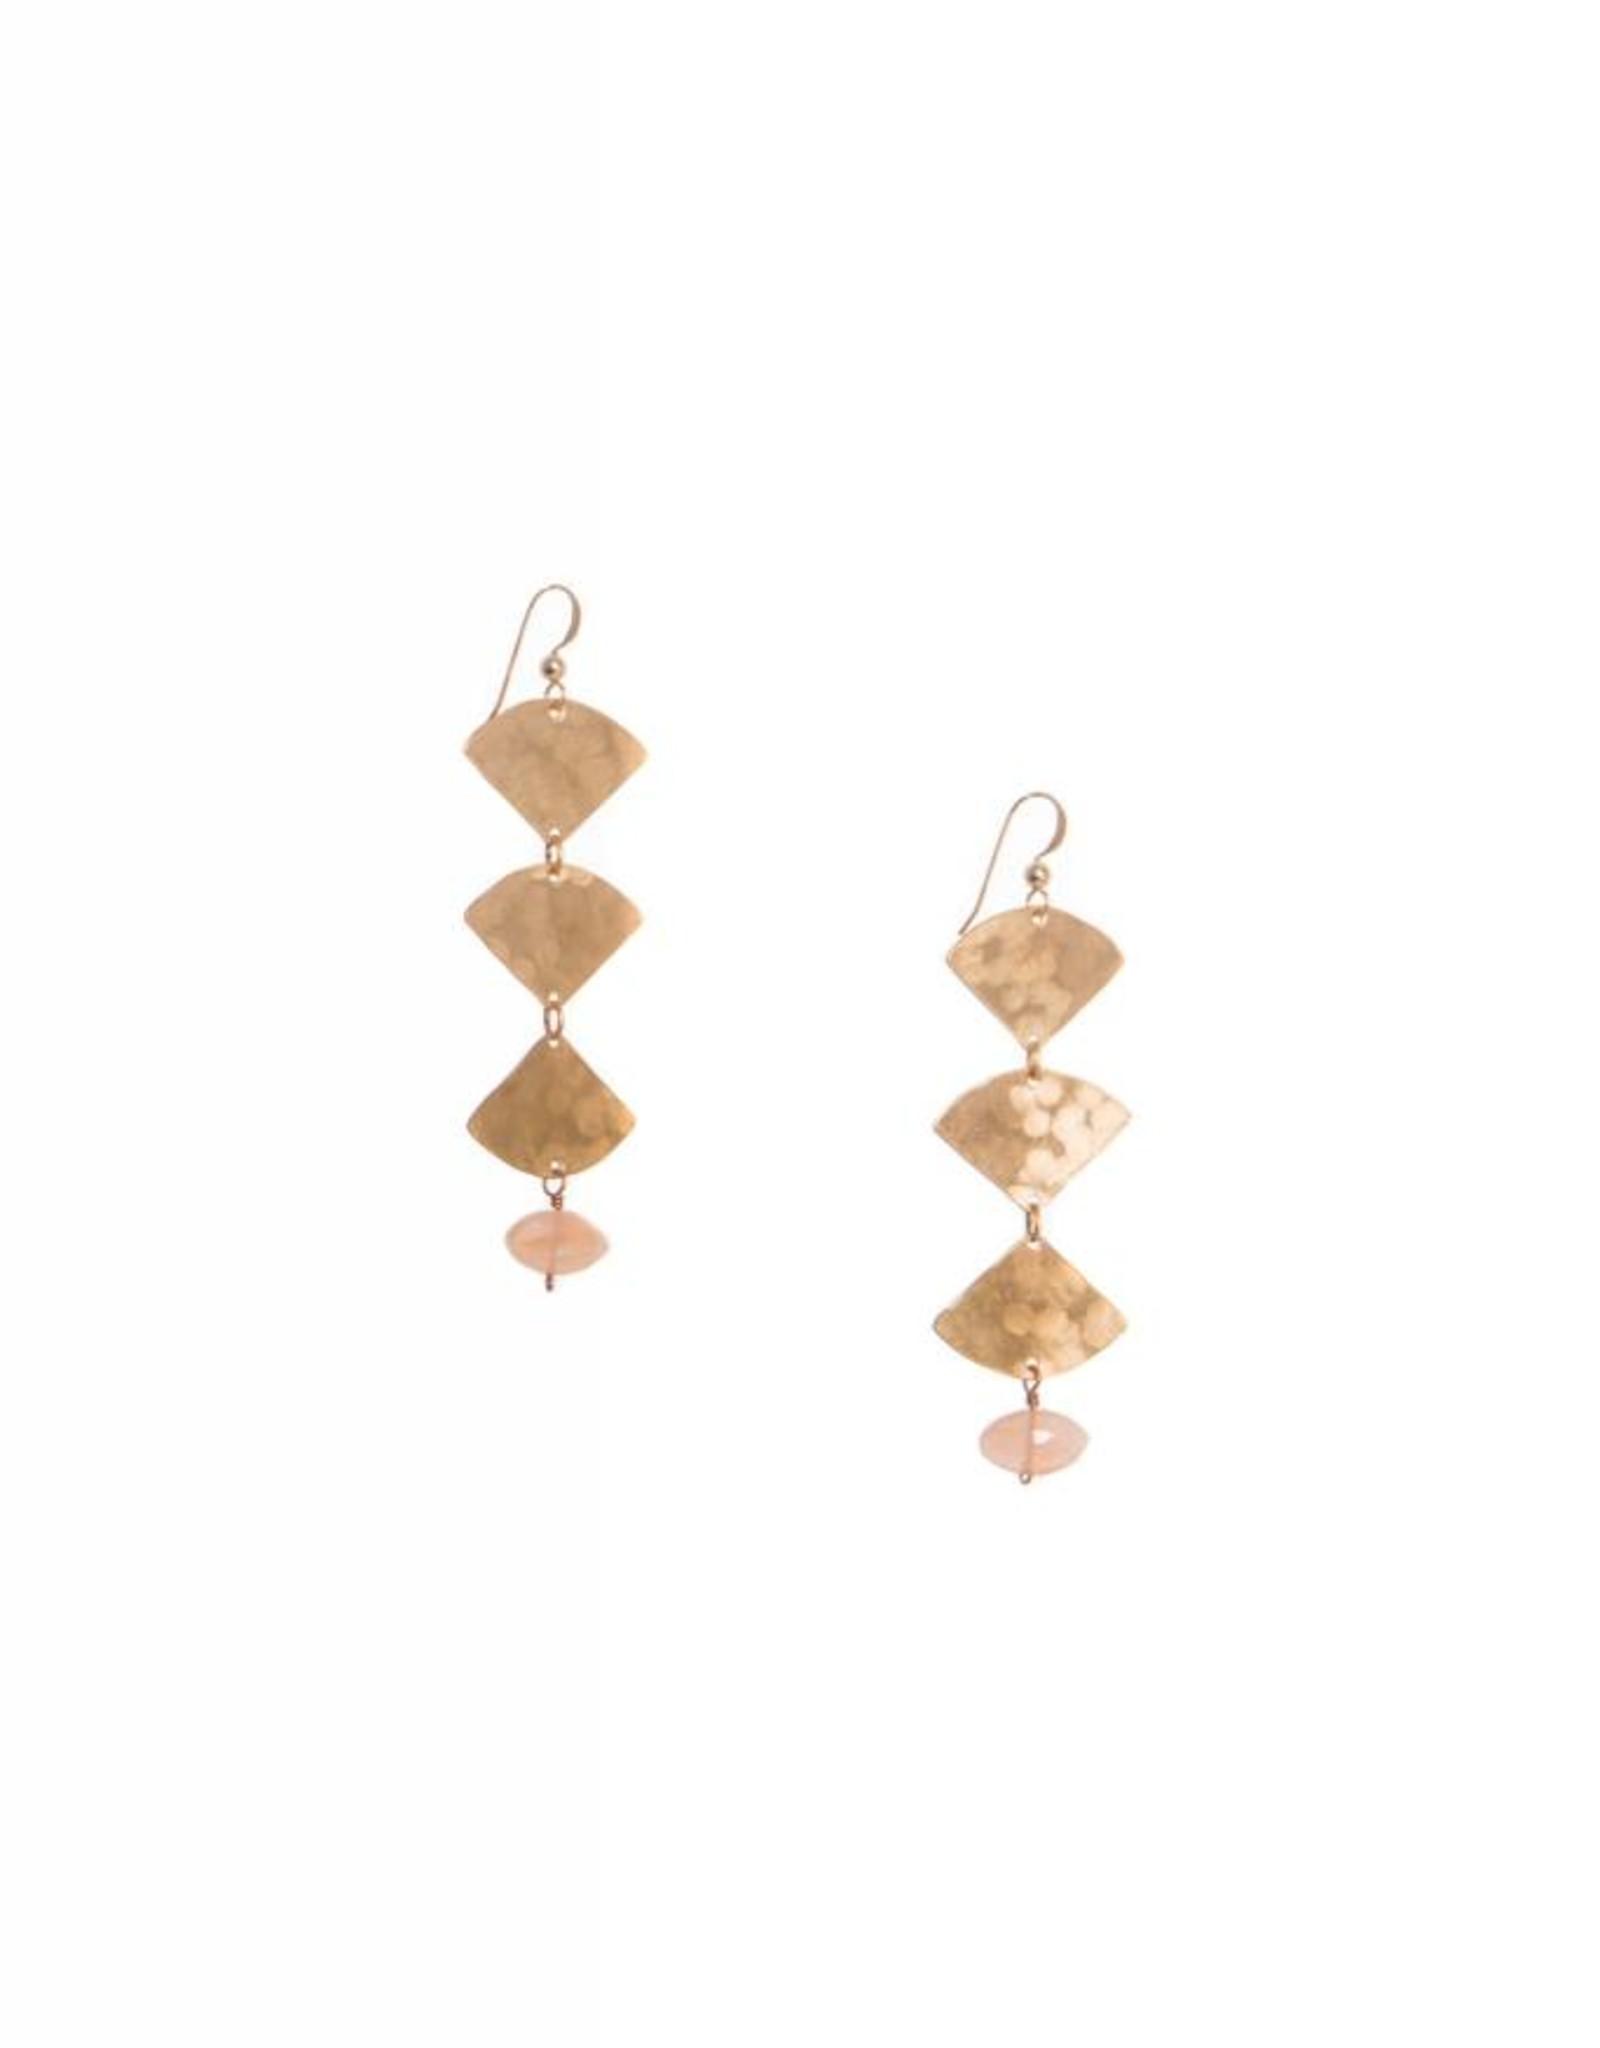 Hailey Gerrits Designs Mella Earrings - Peach Moonstone